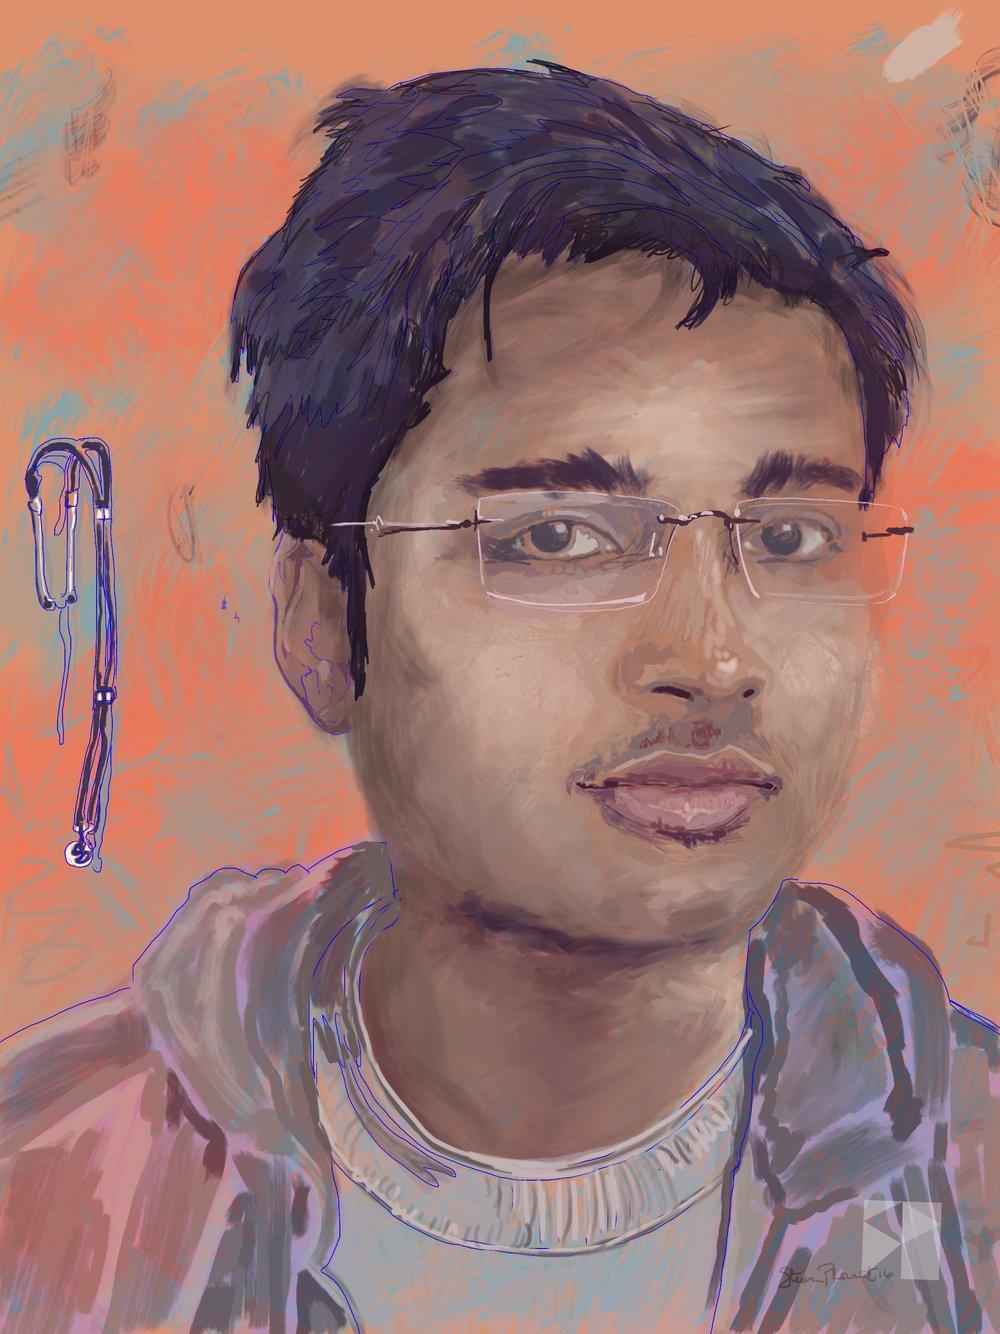 Shankar   FBSelfie, ProCreate, Apple Pencil, Photoshop, iPad, Desktop Digital Image Dimensions Variable © SP.2017